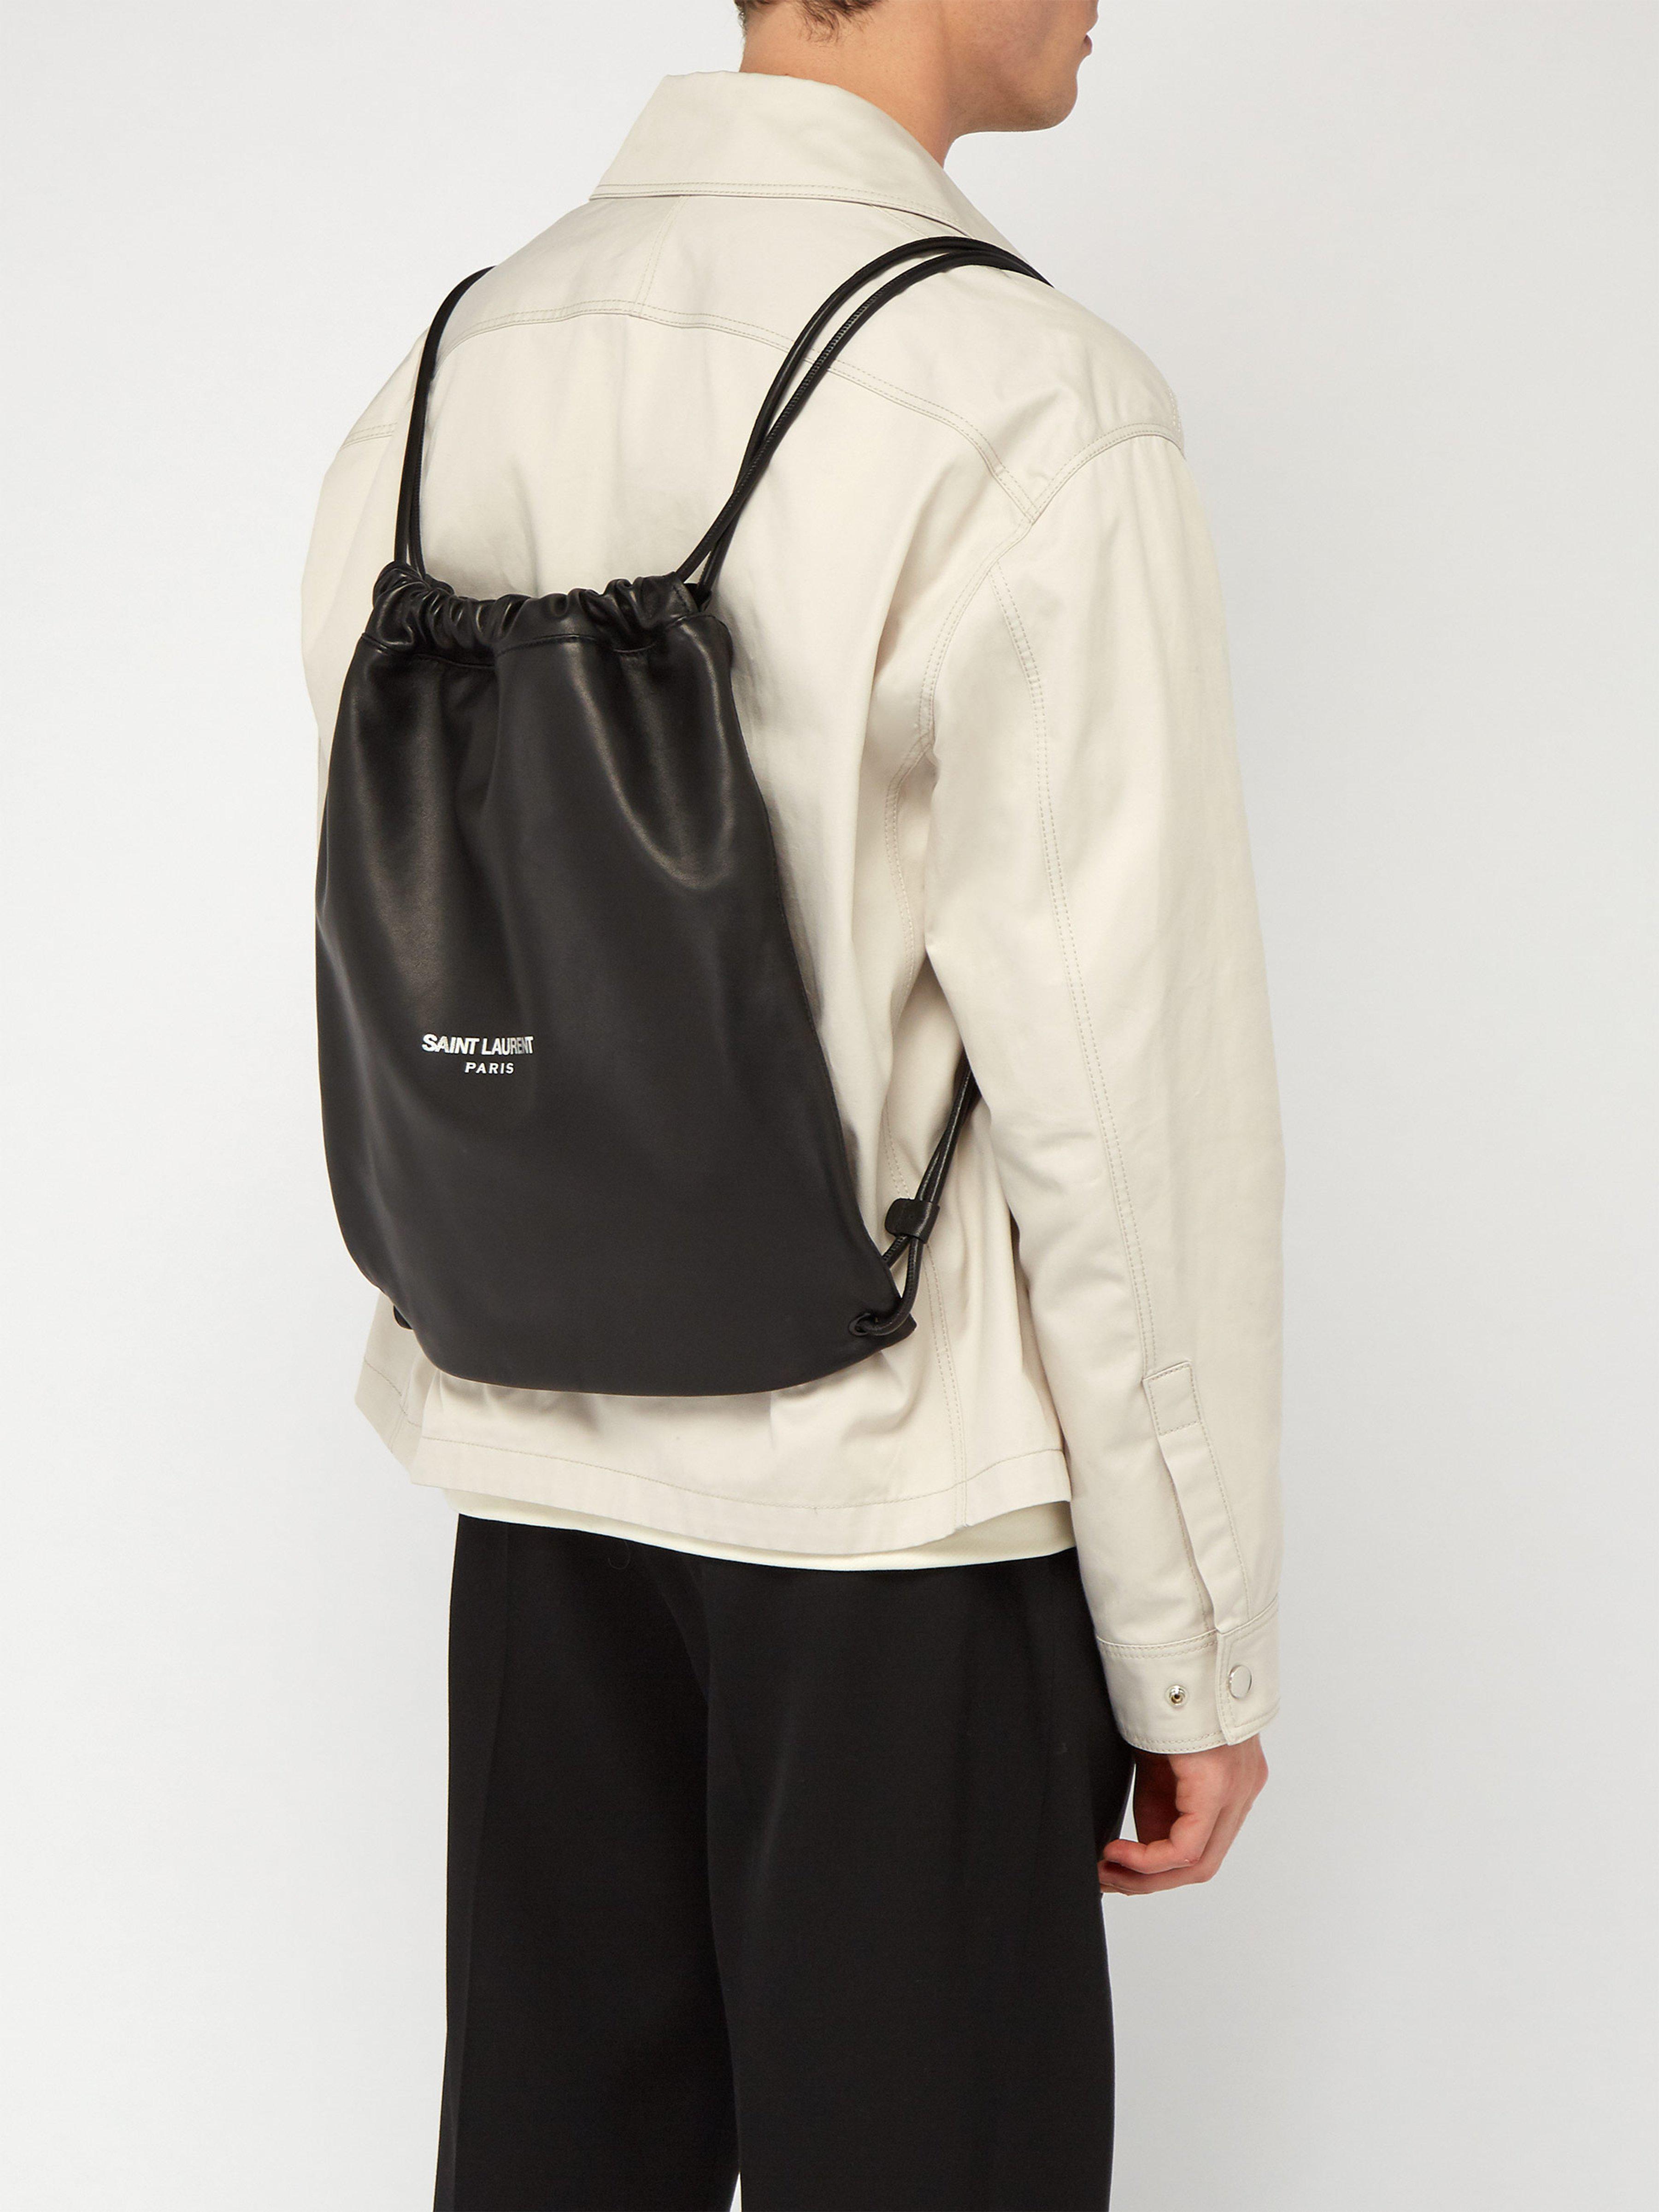 279231f36eb17 Saint Laurent Teddy Logo Print Leather Backpack in Black for Men - Lyst